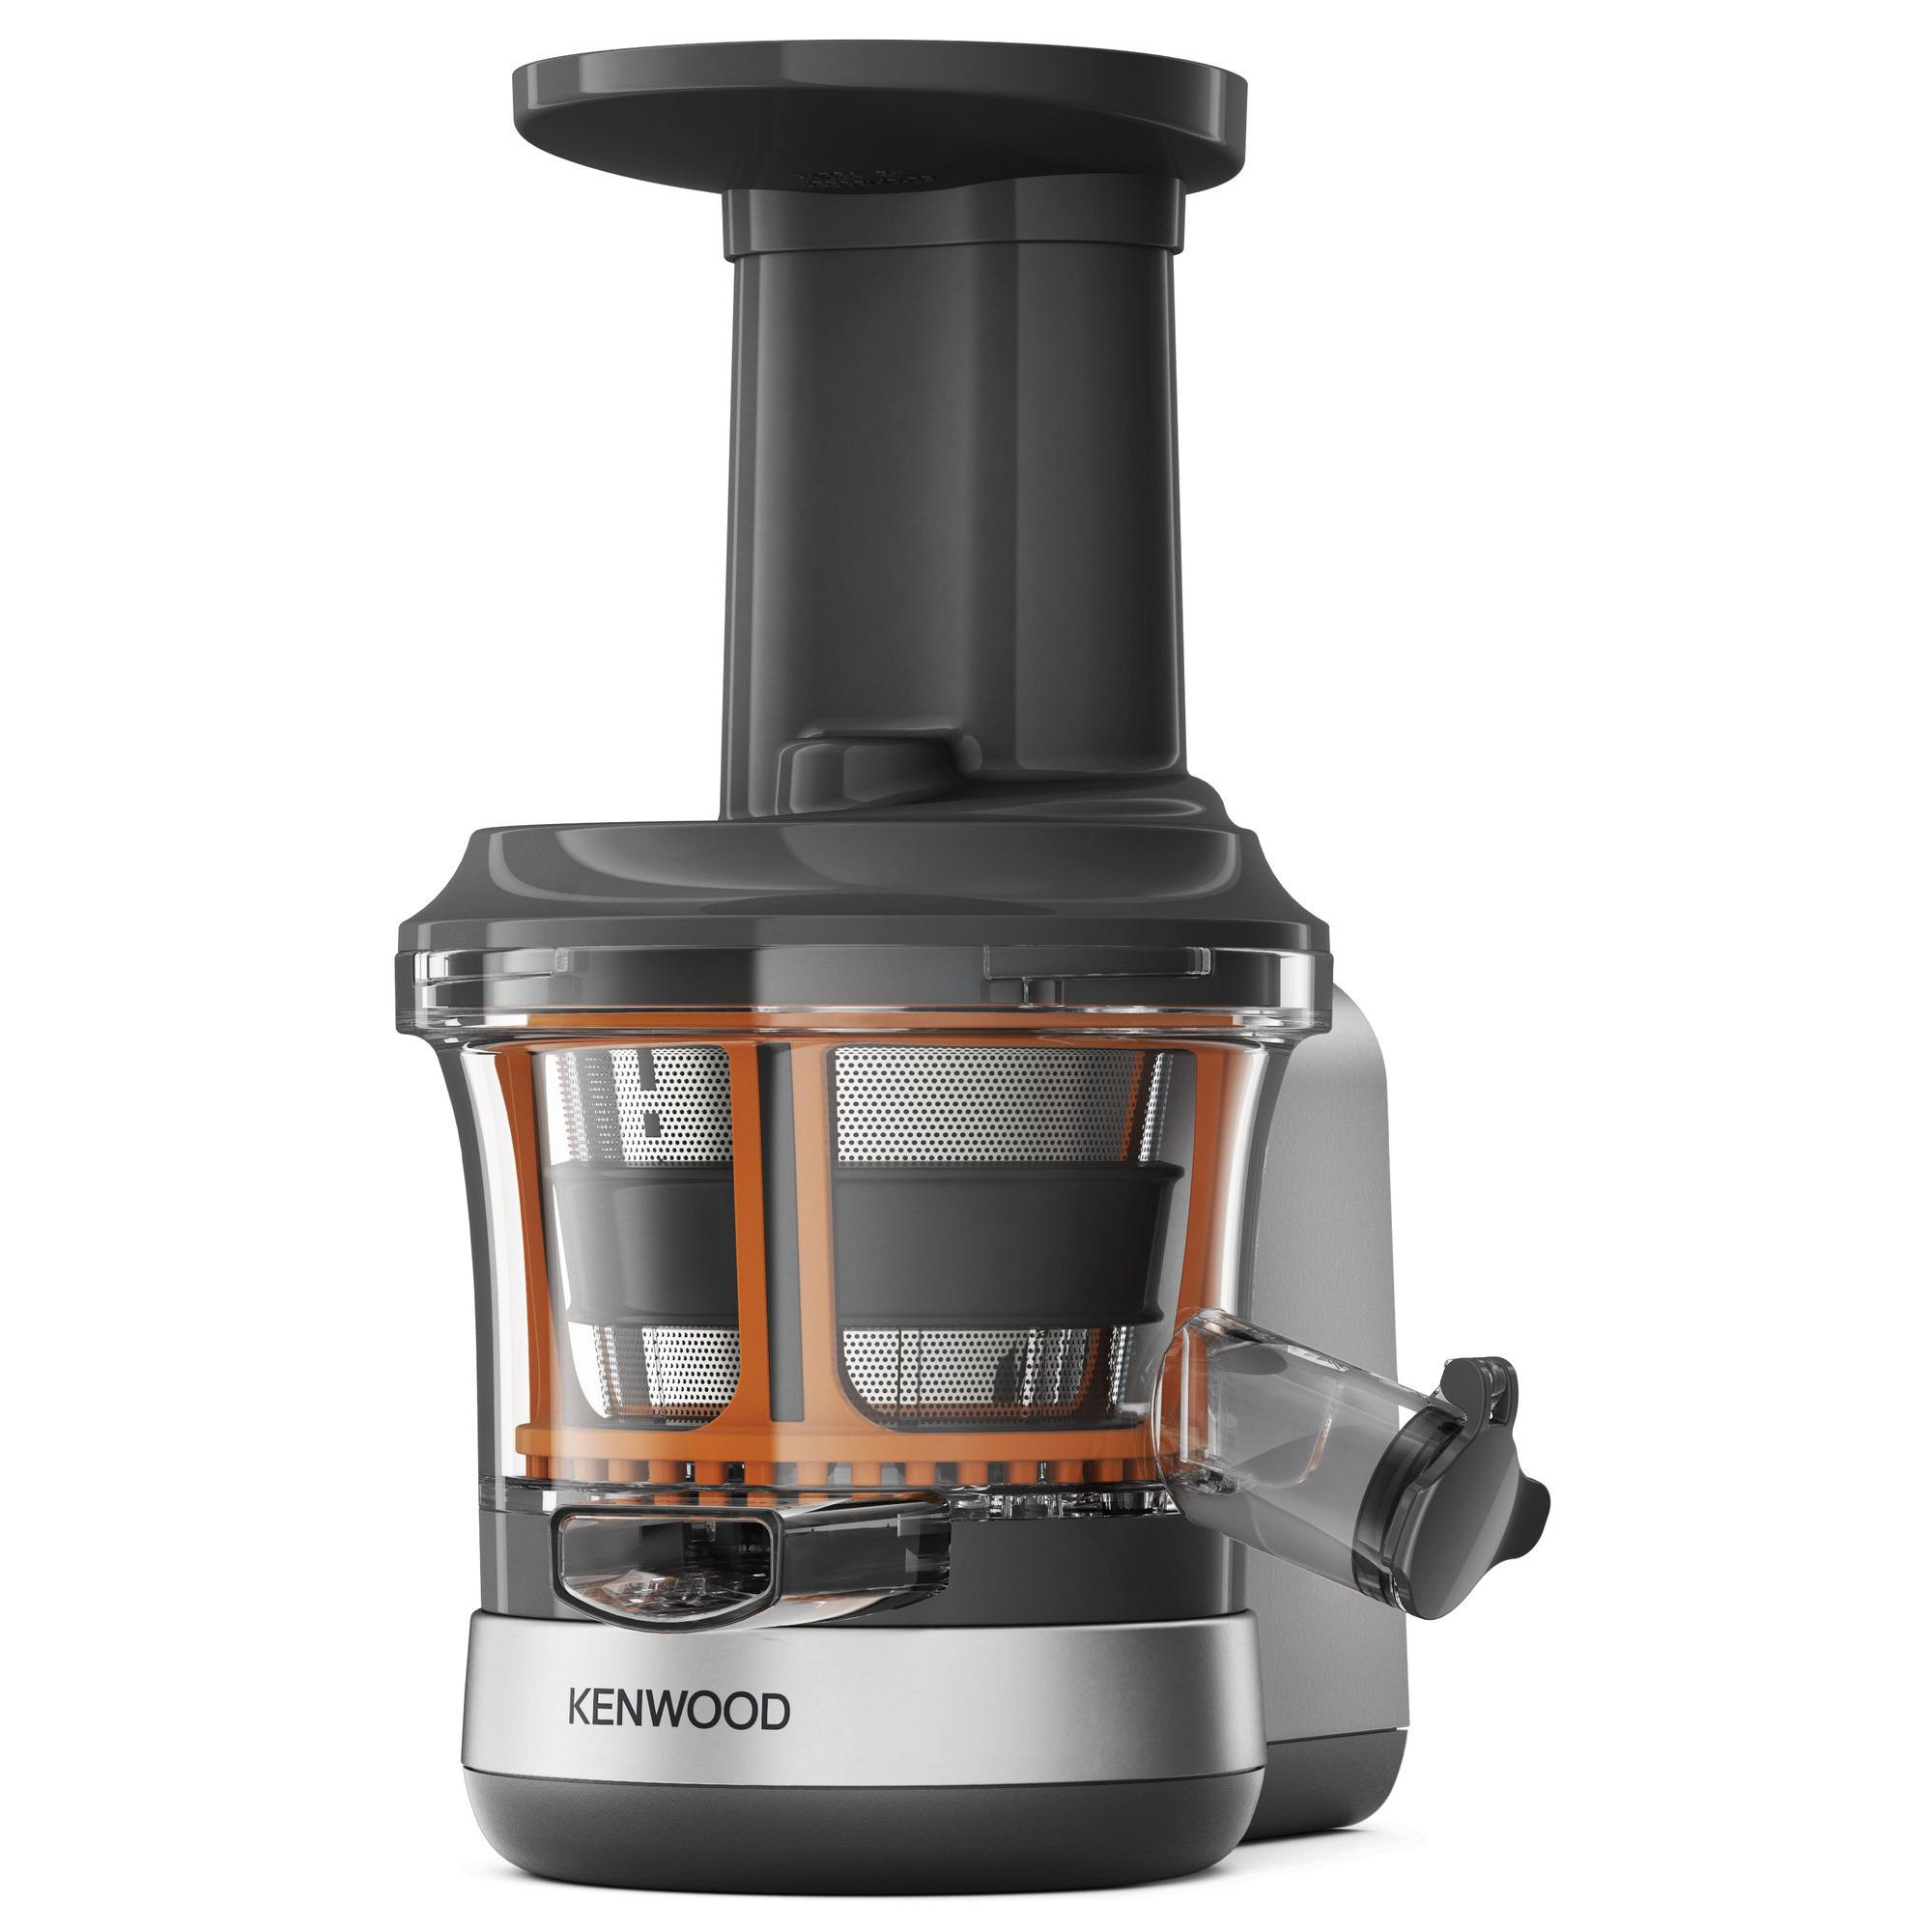 Kenwood KAX720PL slow juicer